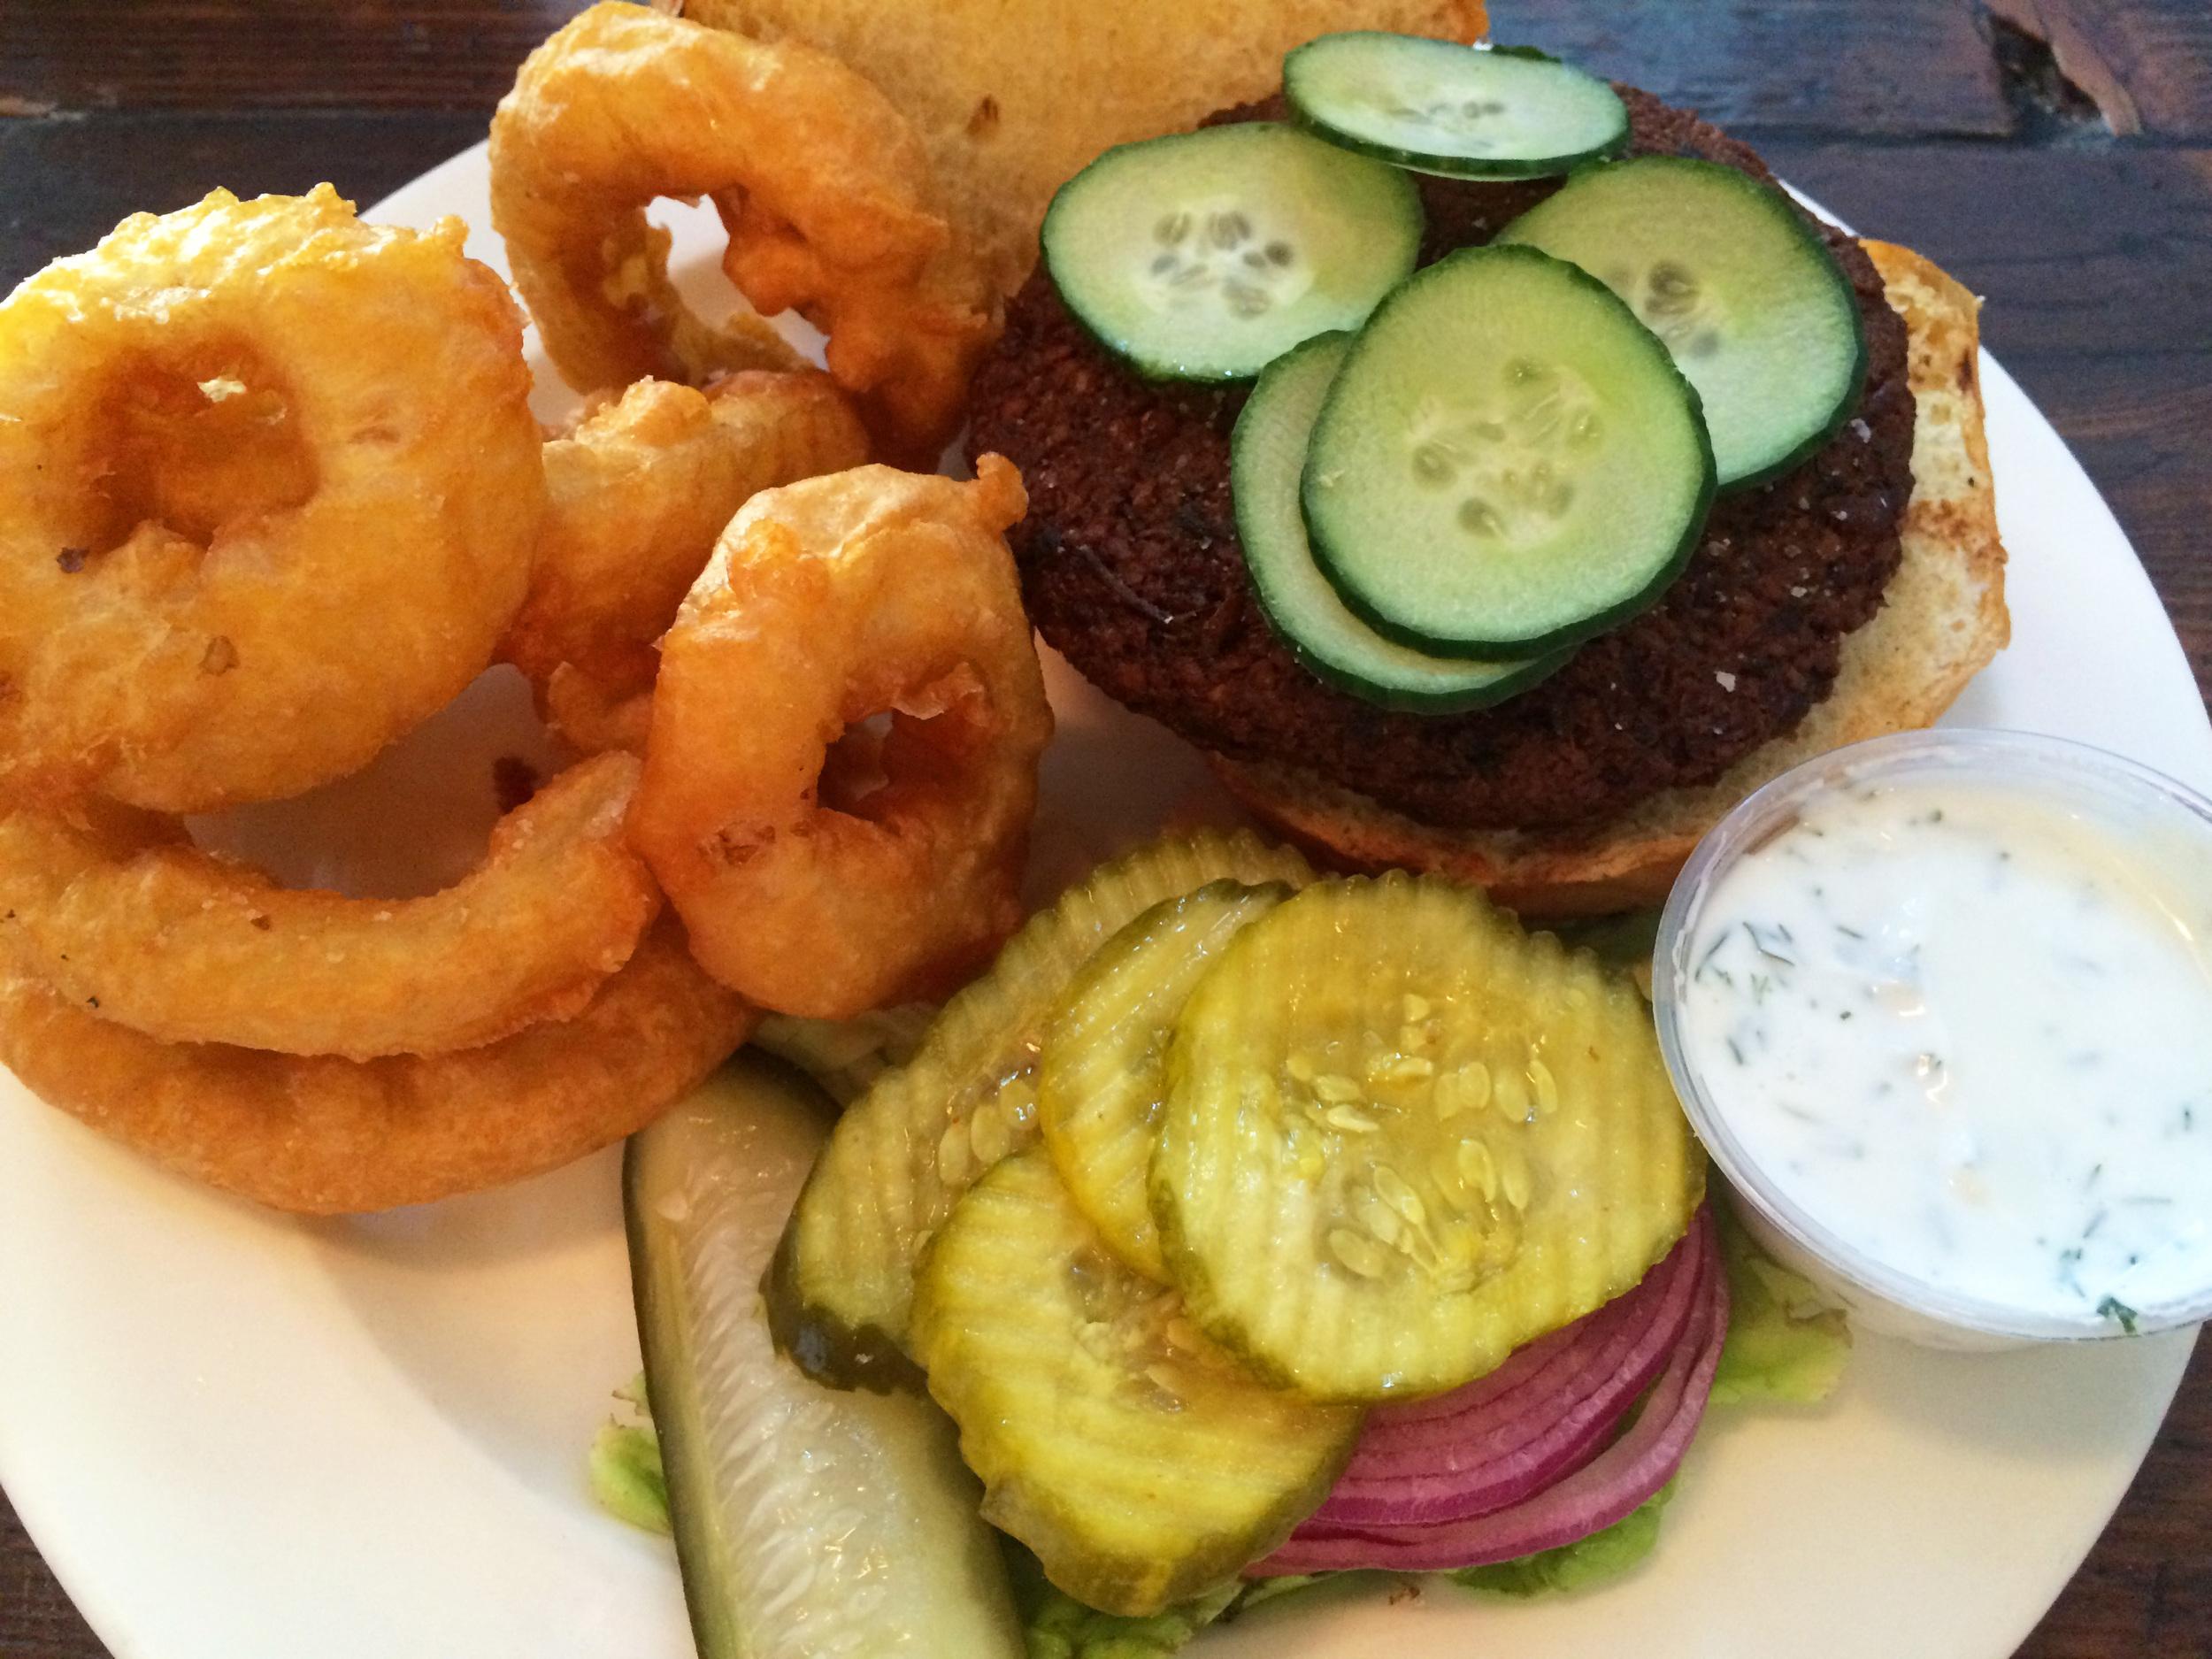 Chickpea burger at DuMont Burger